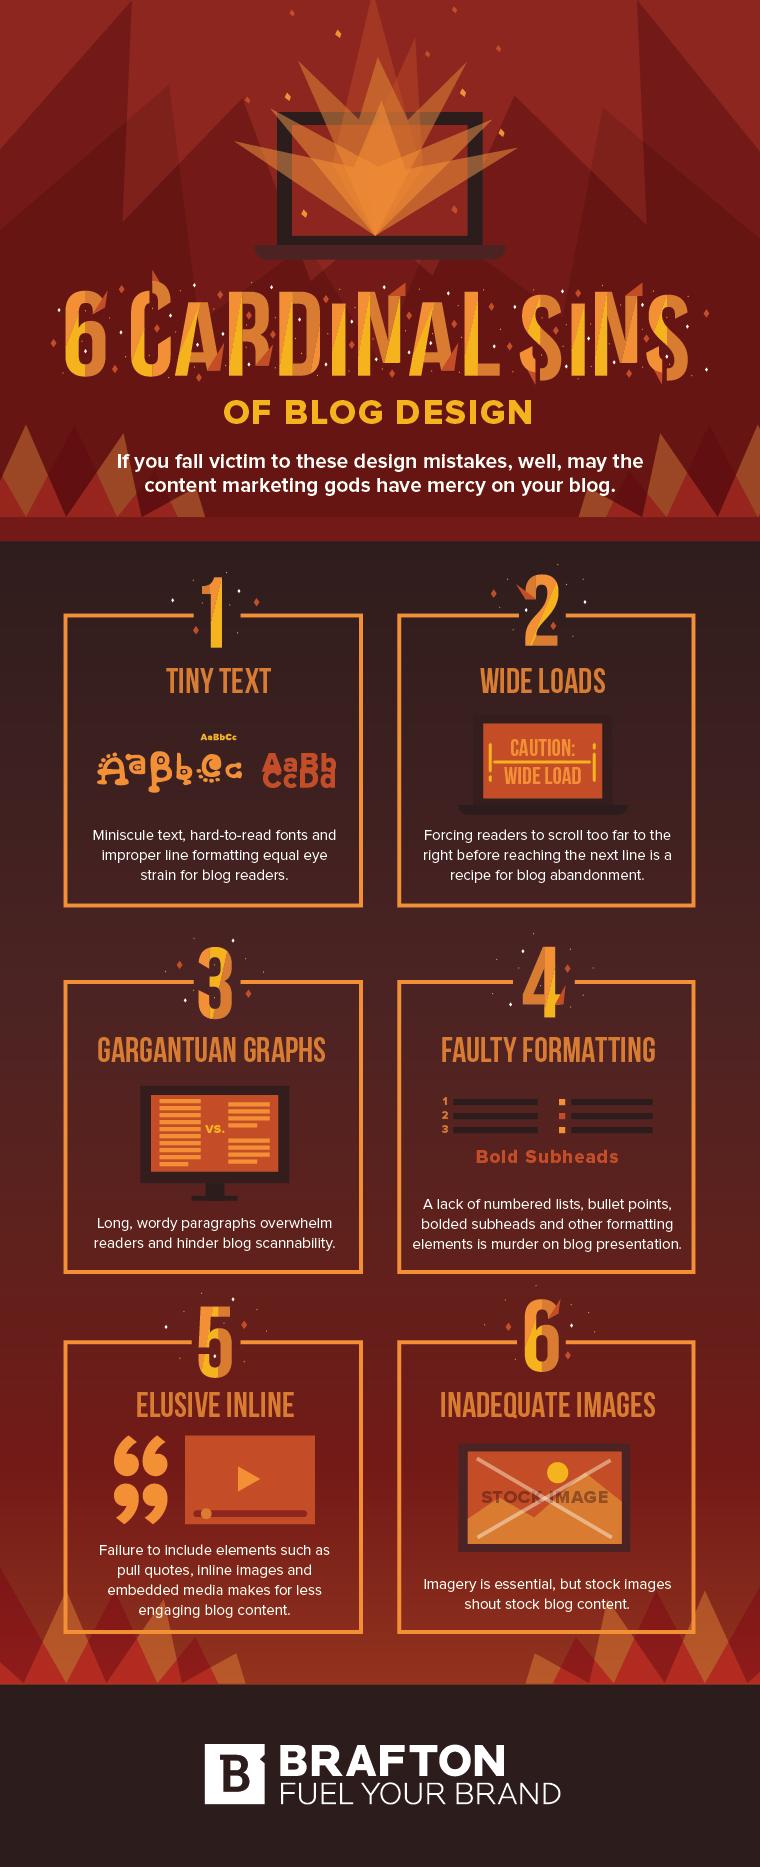 6 Cardinal Sins Infographic.jpg